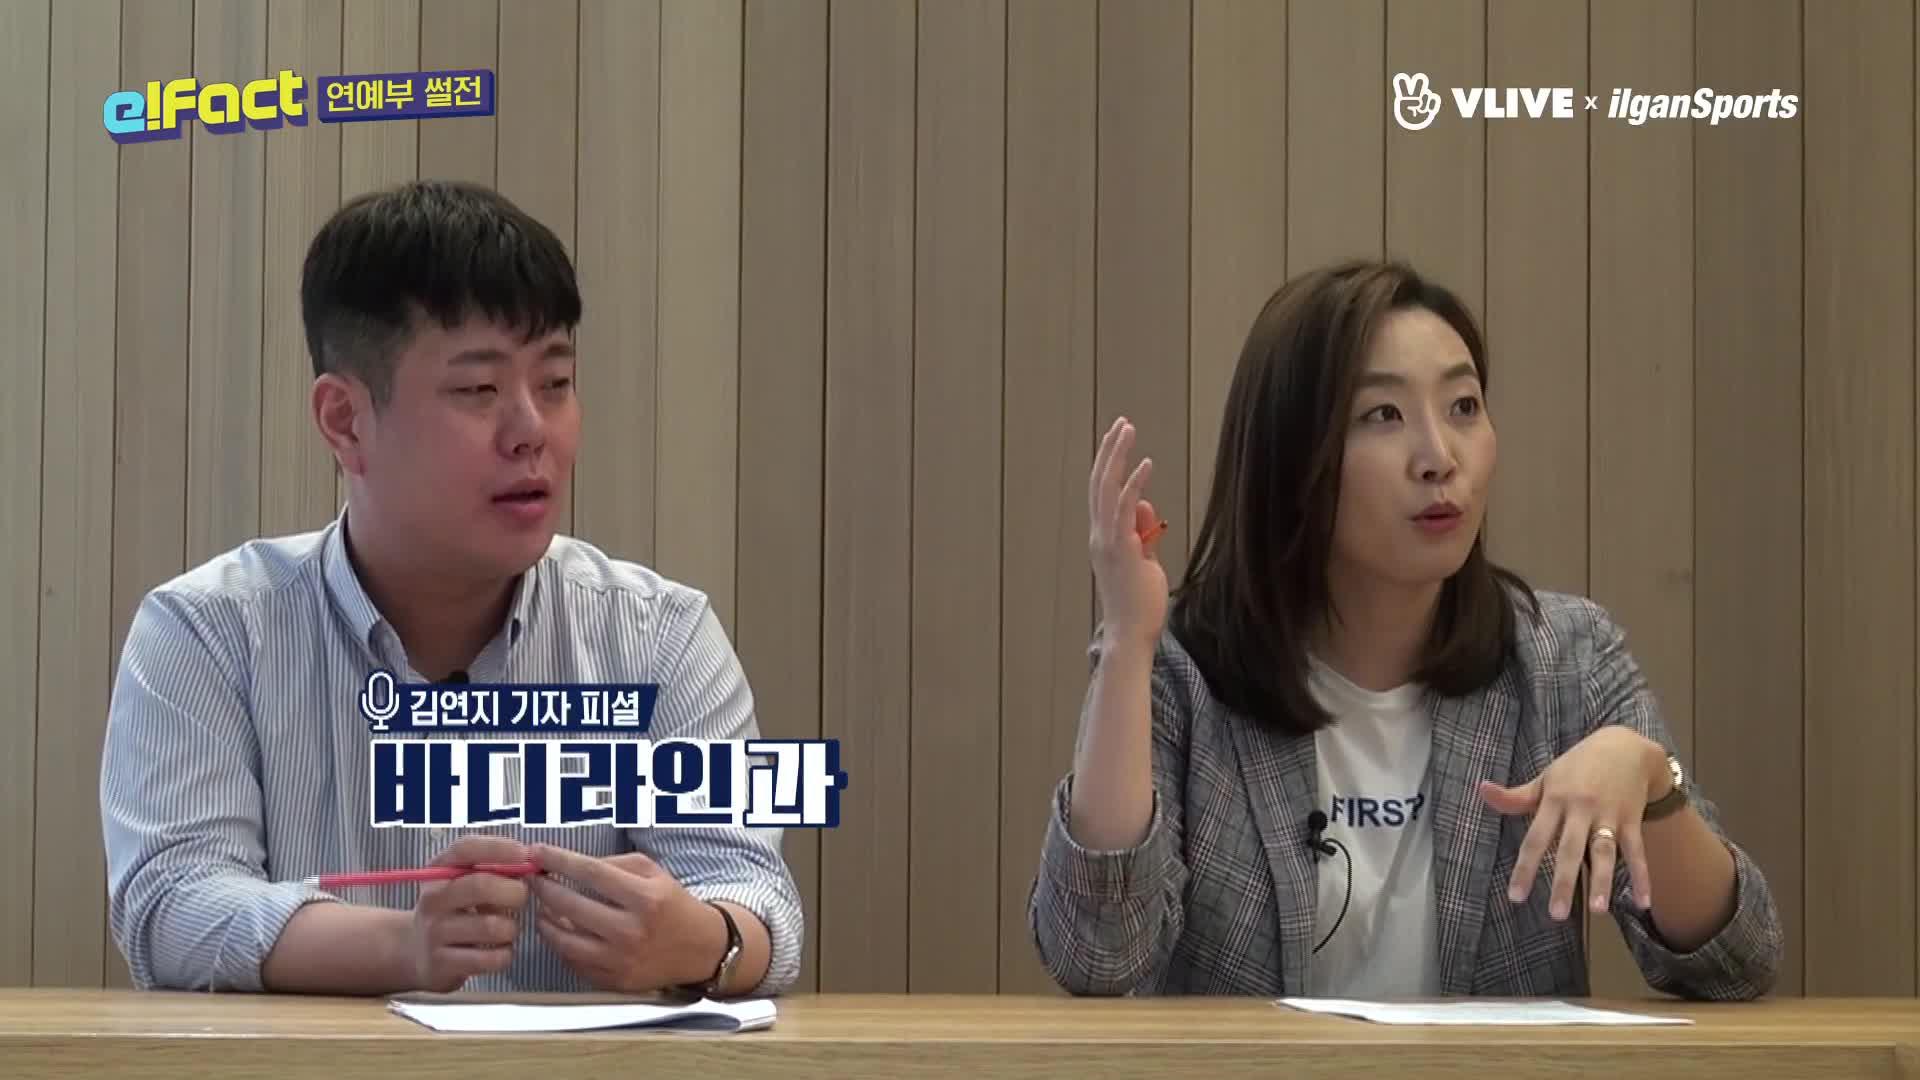 [e!Fact_썰전] 스타들의 SNS 득? 독? 설리의 역대급 인스타 사건은?